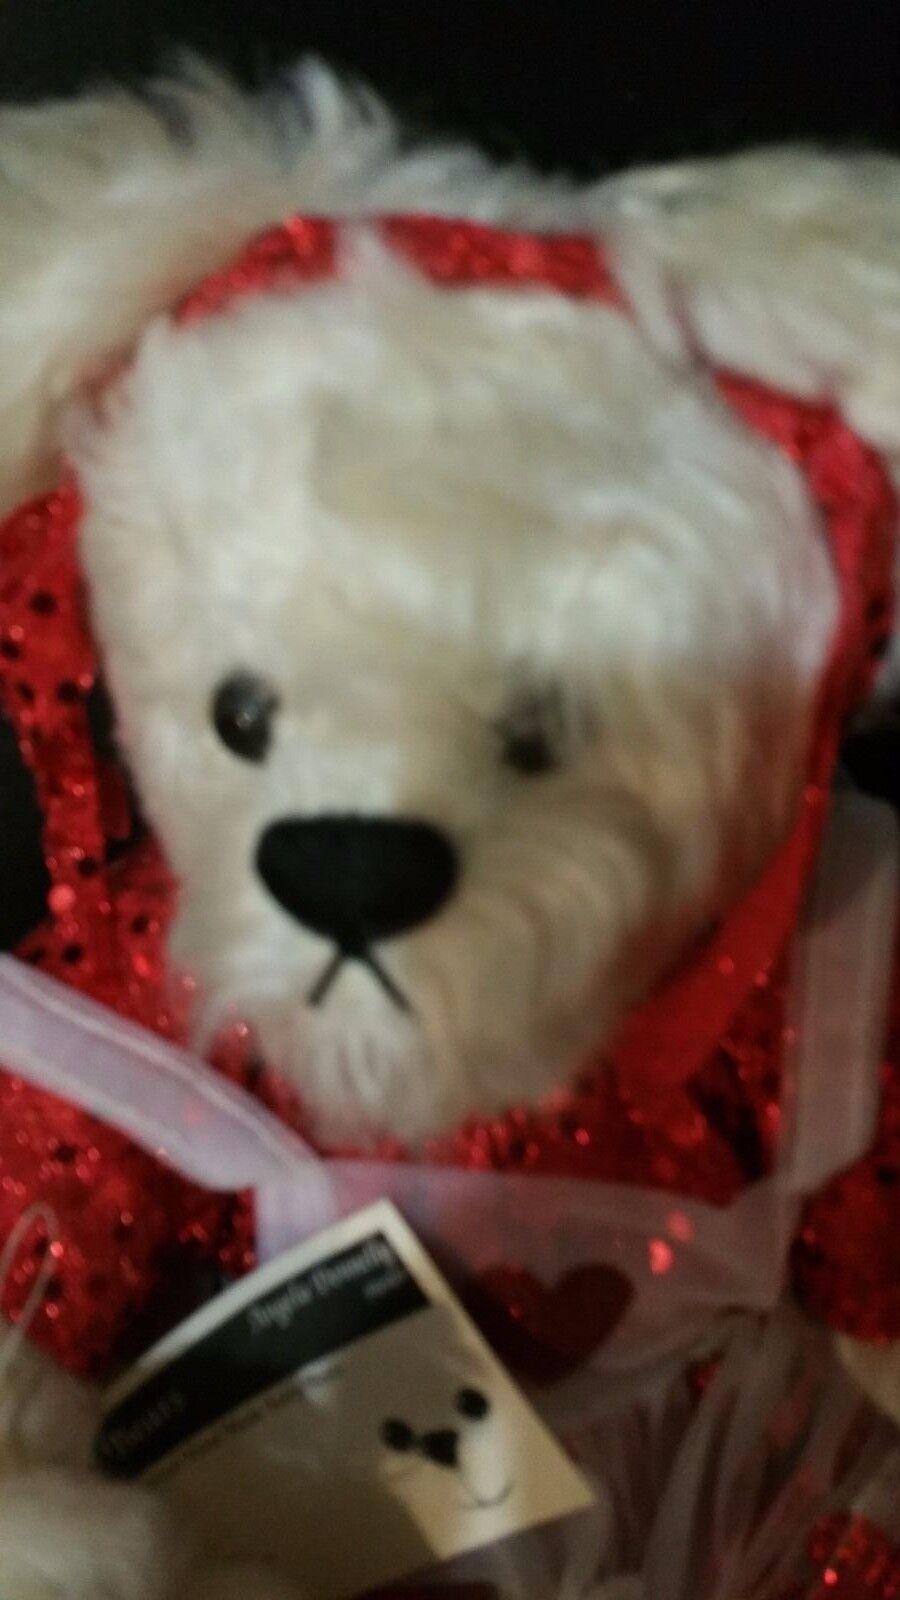 AD Bears Bear Valerie 13  By Angela Donnelly - The Original Hand Made Teddy Bear